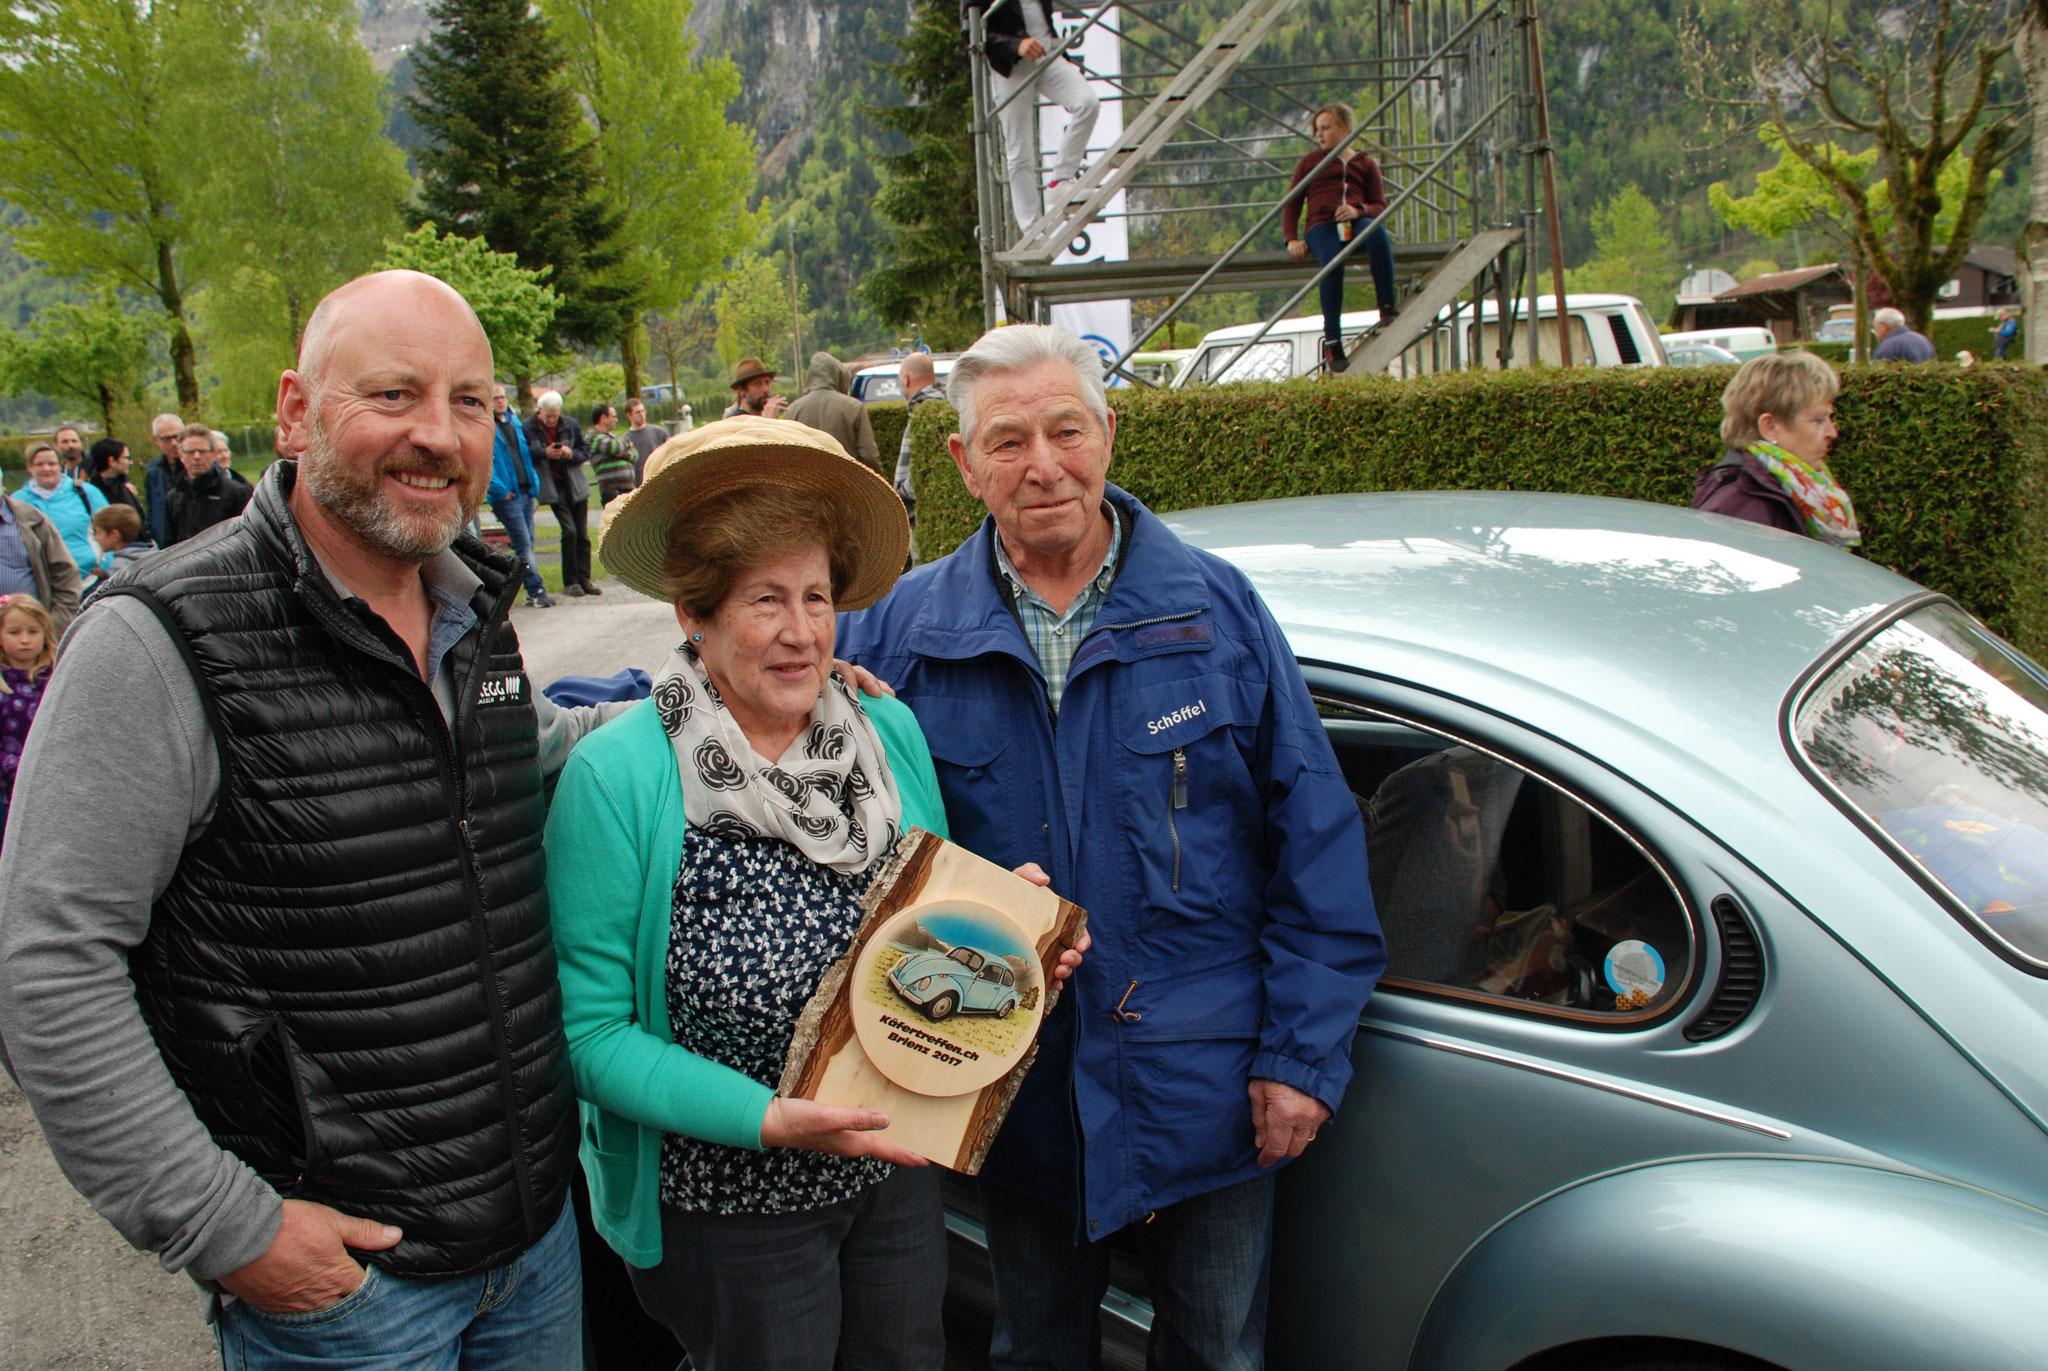 VW Käfer von Elisabethe Baumgardner (Kategorie Liebling von Gastgebern Susanne + Marcel Zysset)